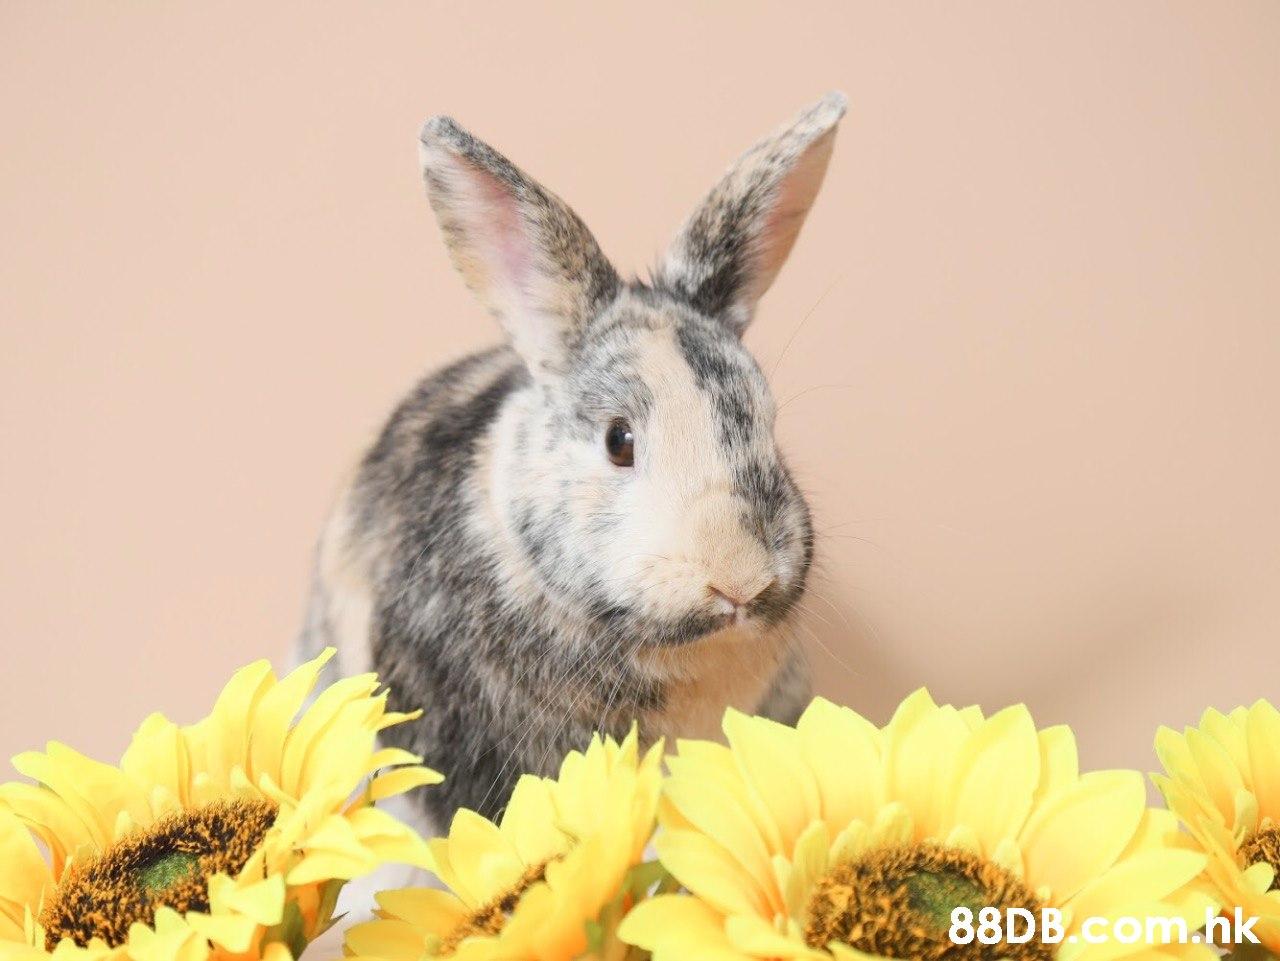 88DB com.nk  Rabbit,Domestic rabbit,Rabbits and Hares,Yellow,Wildlife